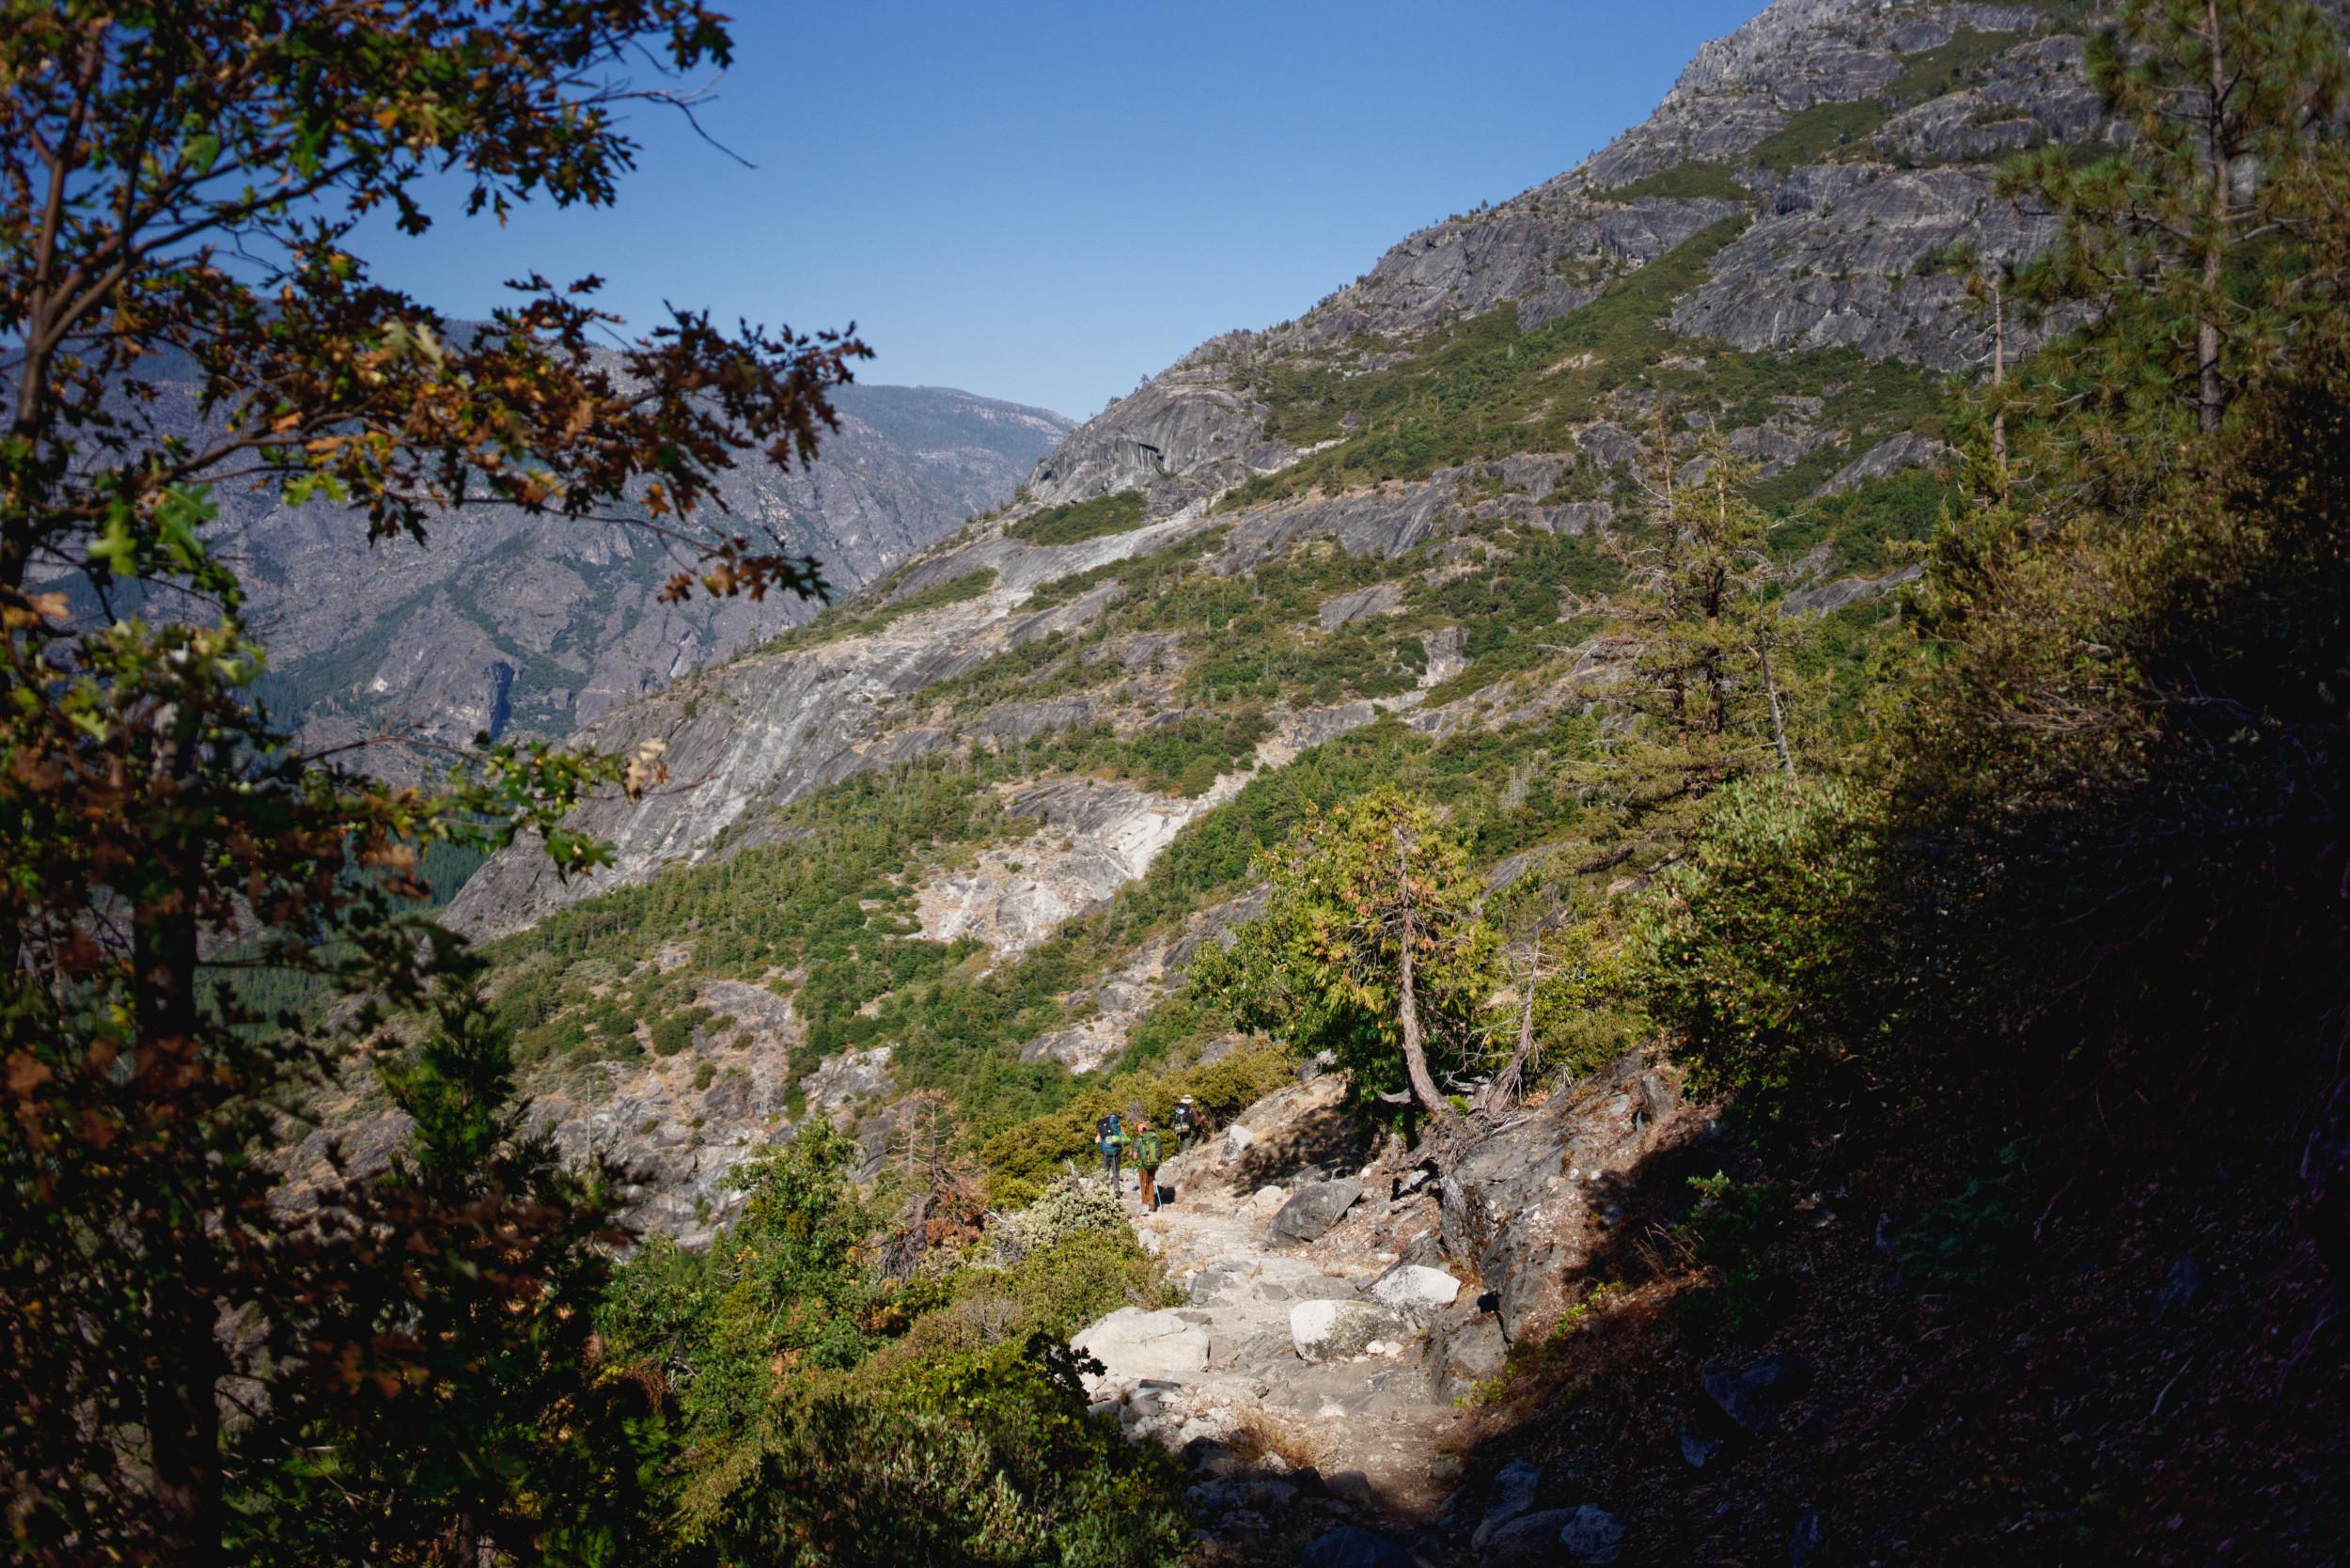 tuolumne-county-adventure-yosemite (130).jpg